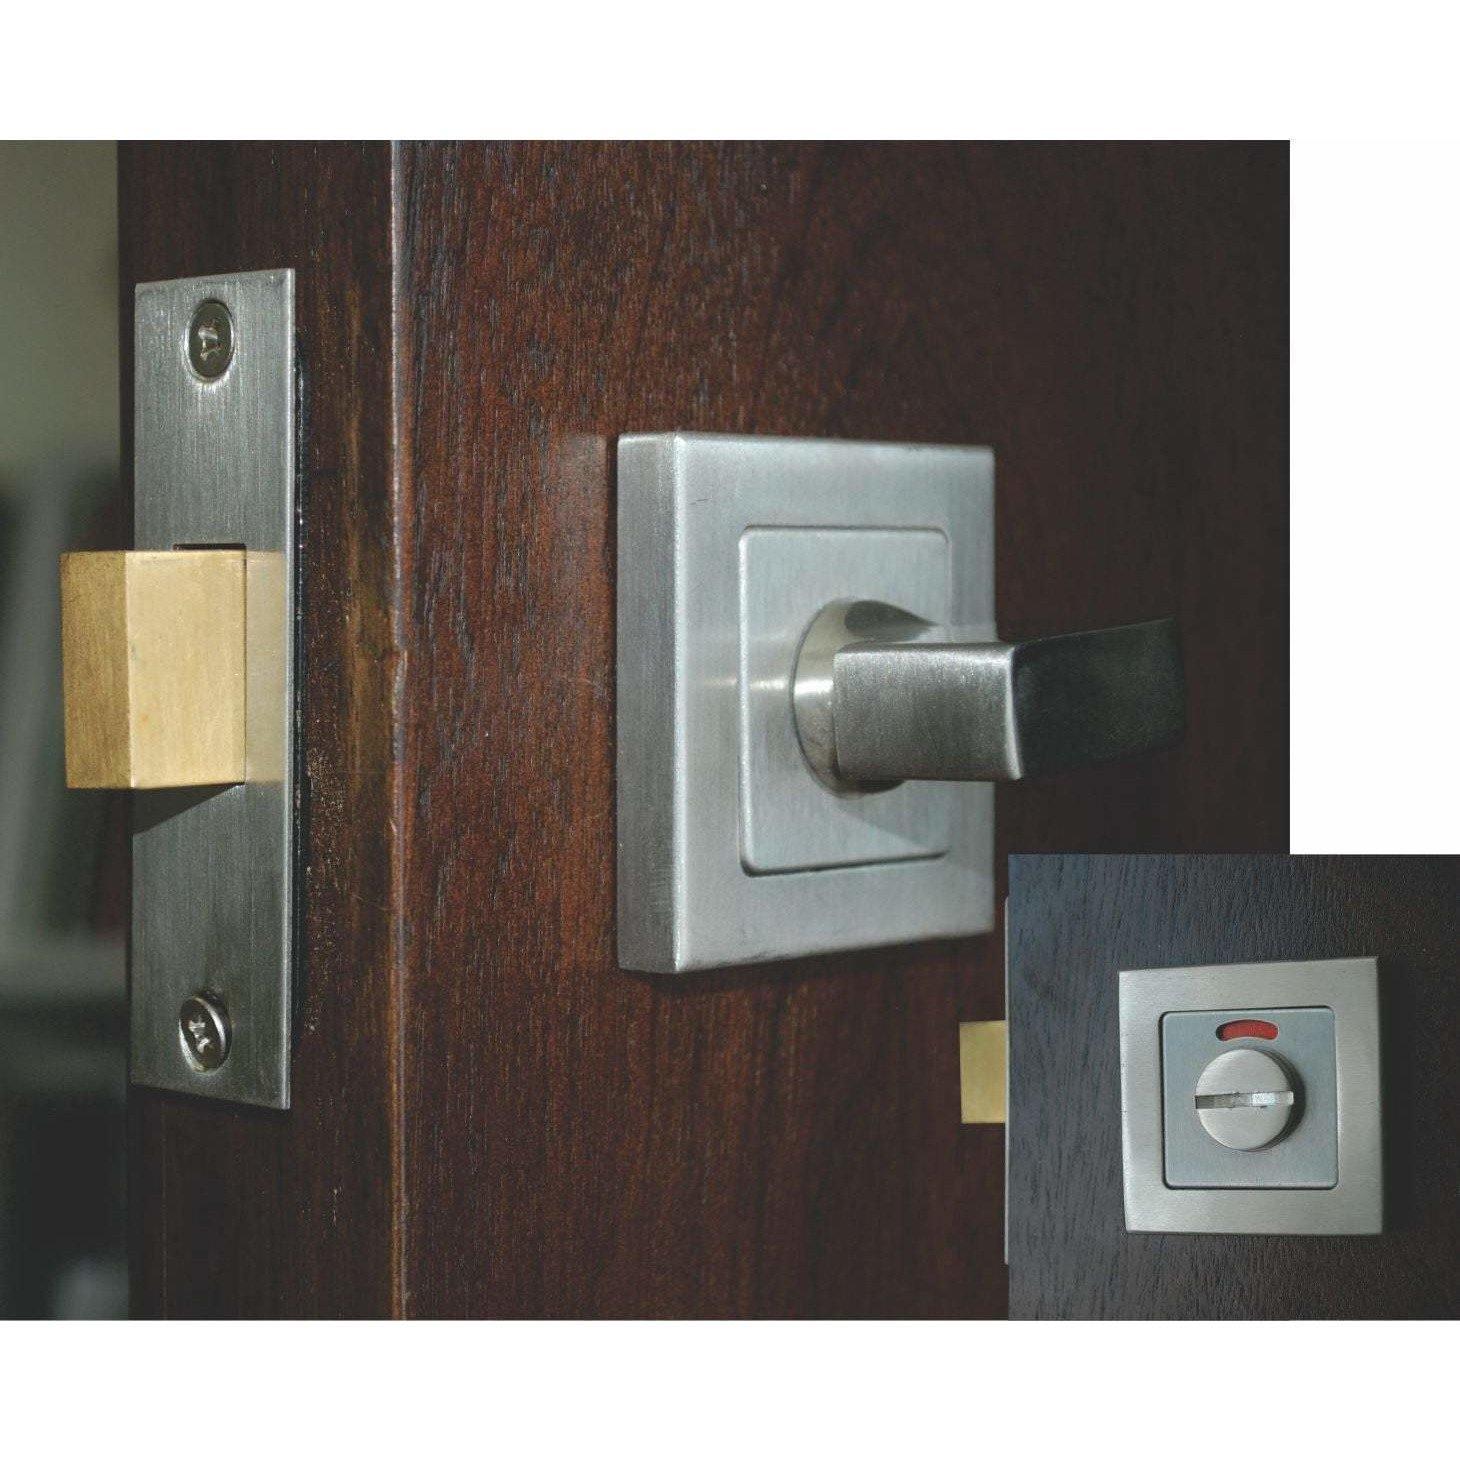 Square wc indicator bolt